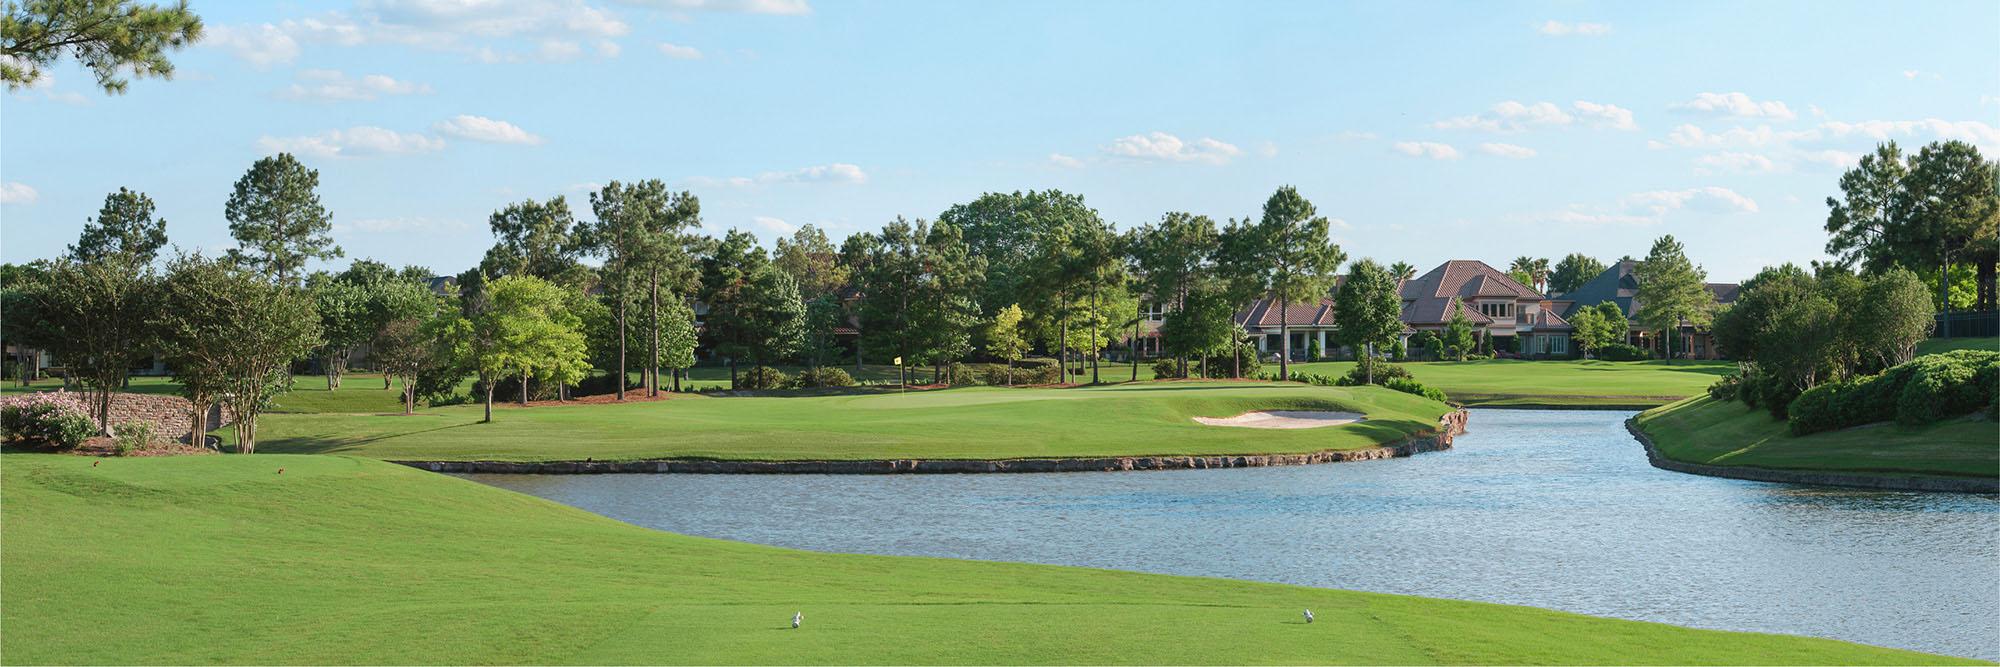 Golf Course Image - Royal Oaks No. 6